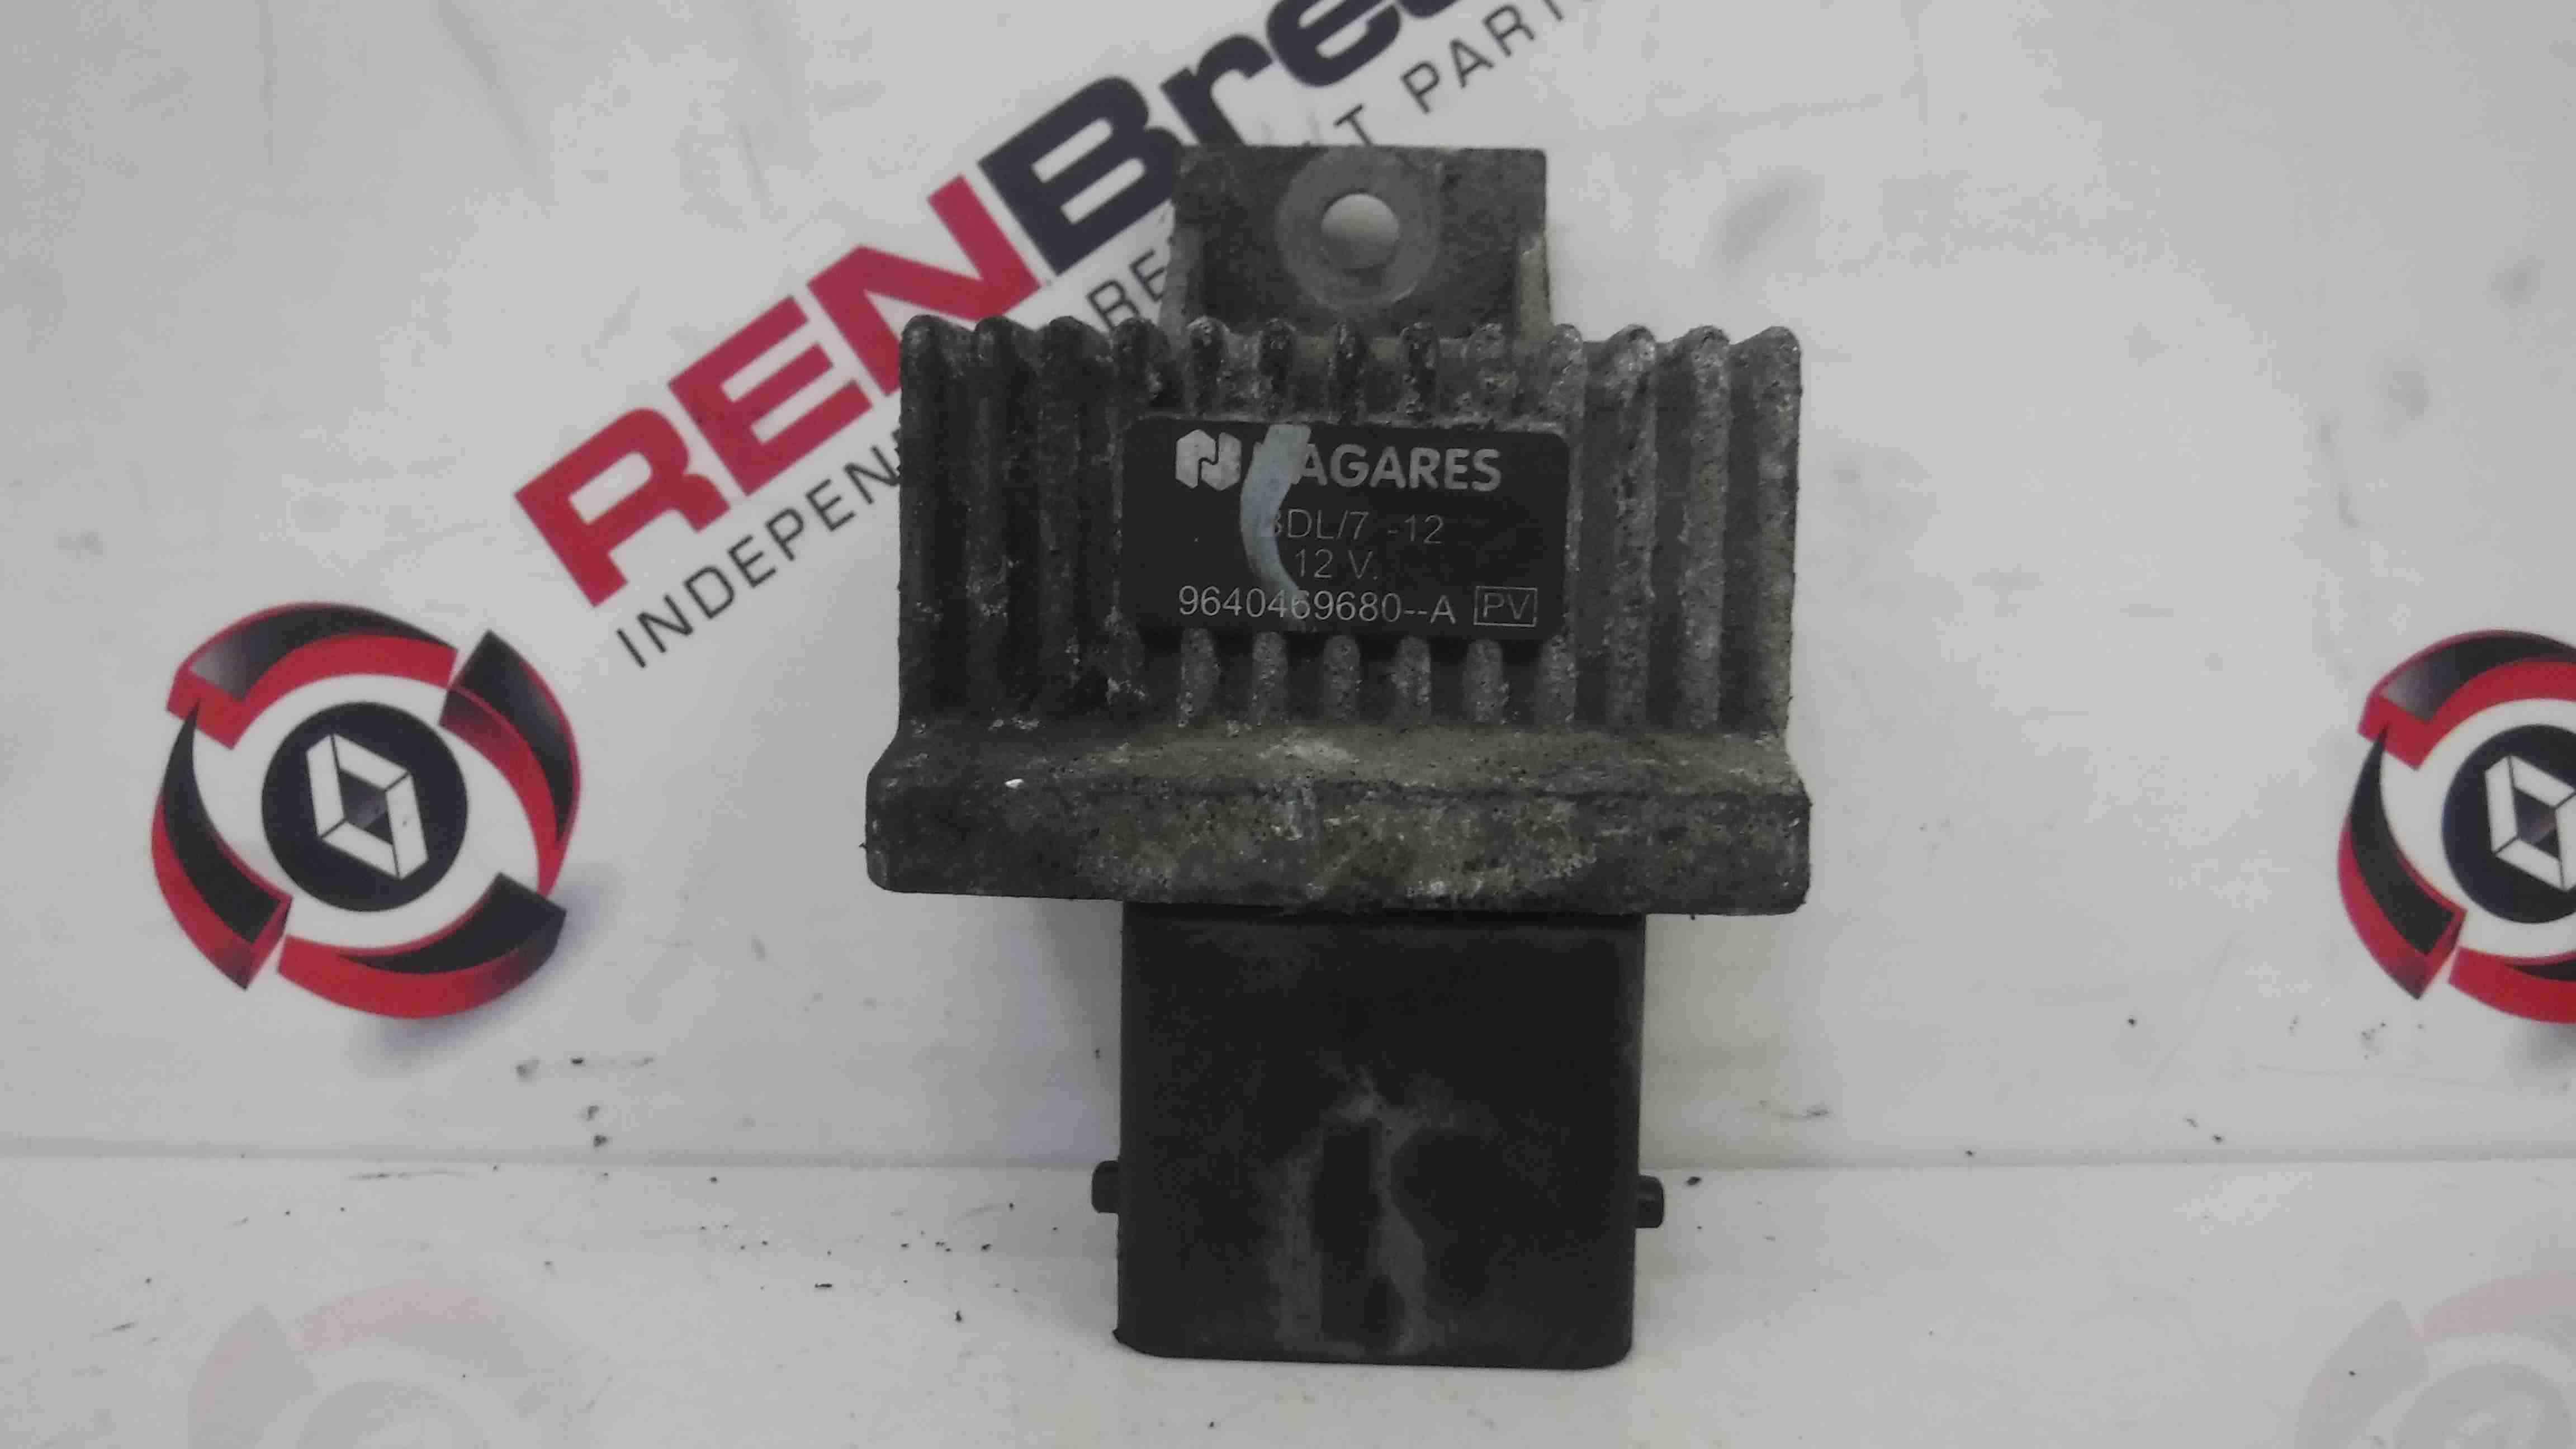 Renault Megane + Scenic 2006-2008 1.5 dCi Glow Plug Relay K9K 732 9640469680